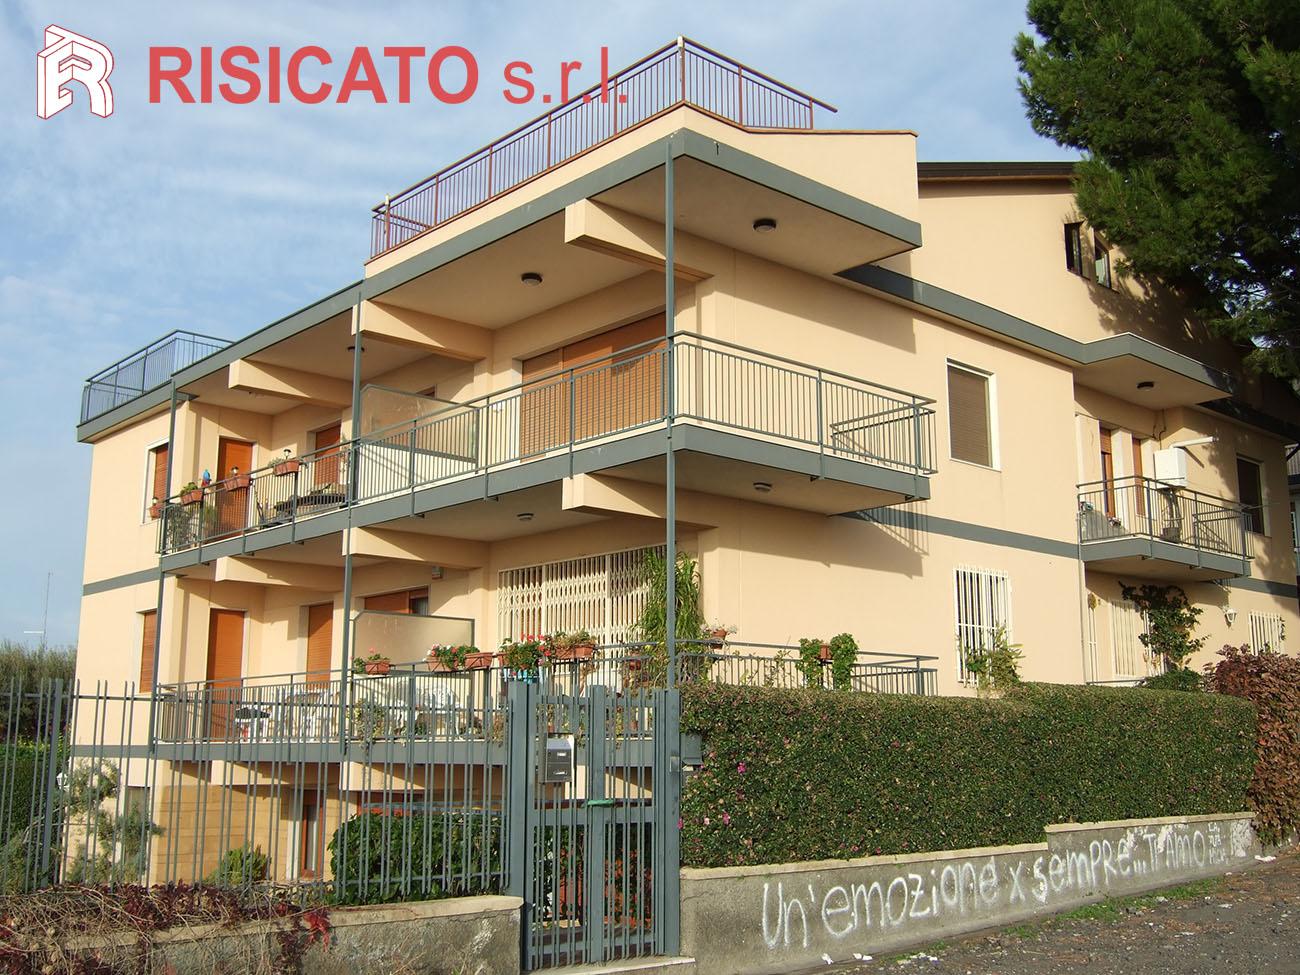 Edilizia residenziale - Impresa Edile Catania - Risicato s.r.l.Impresa Edile Catania – Risicato ...